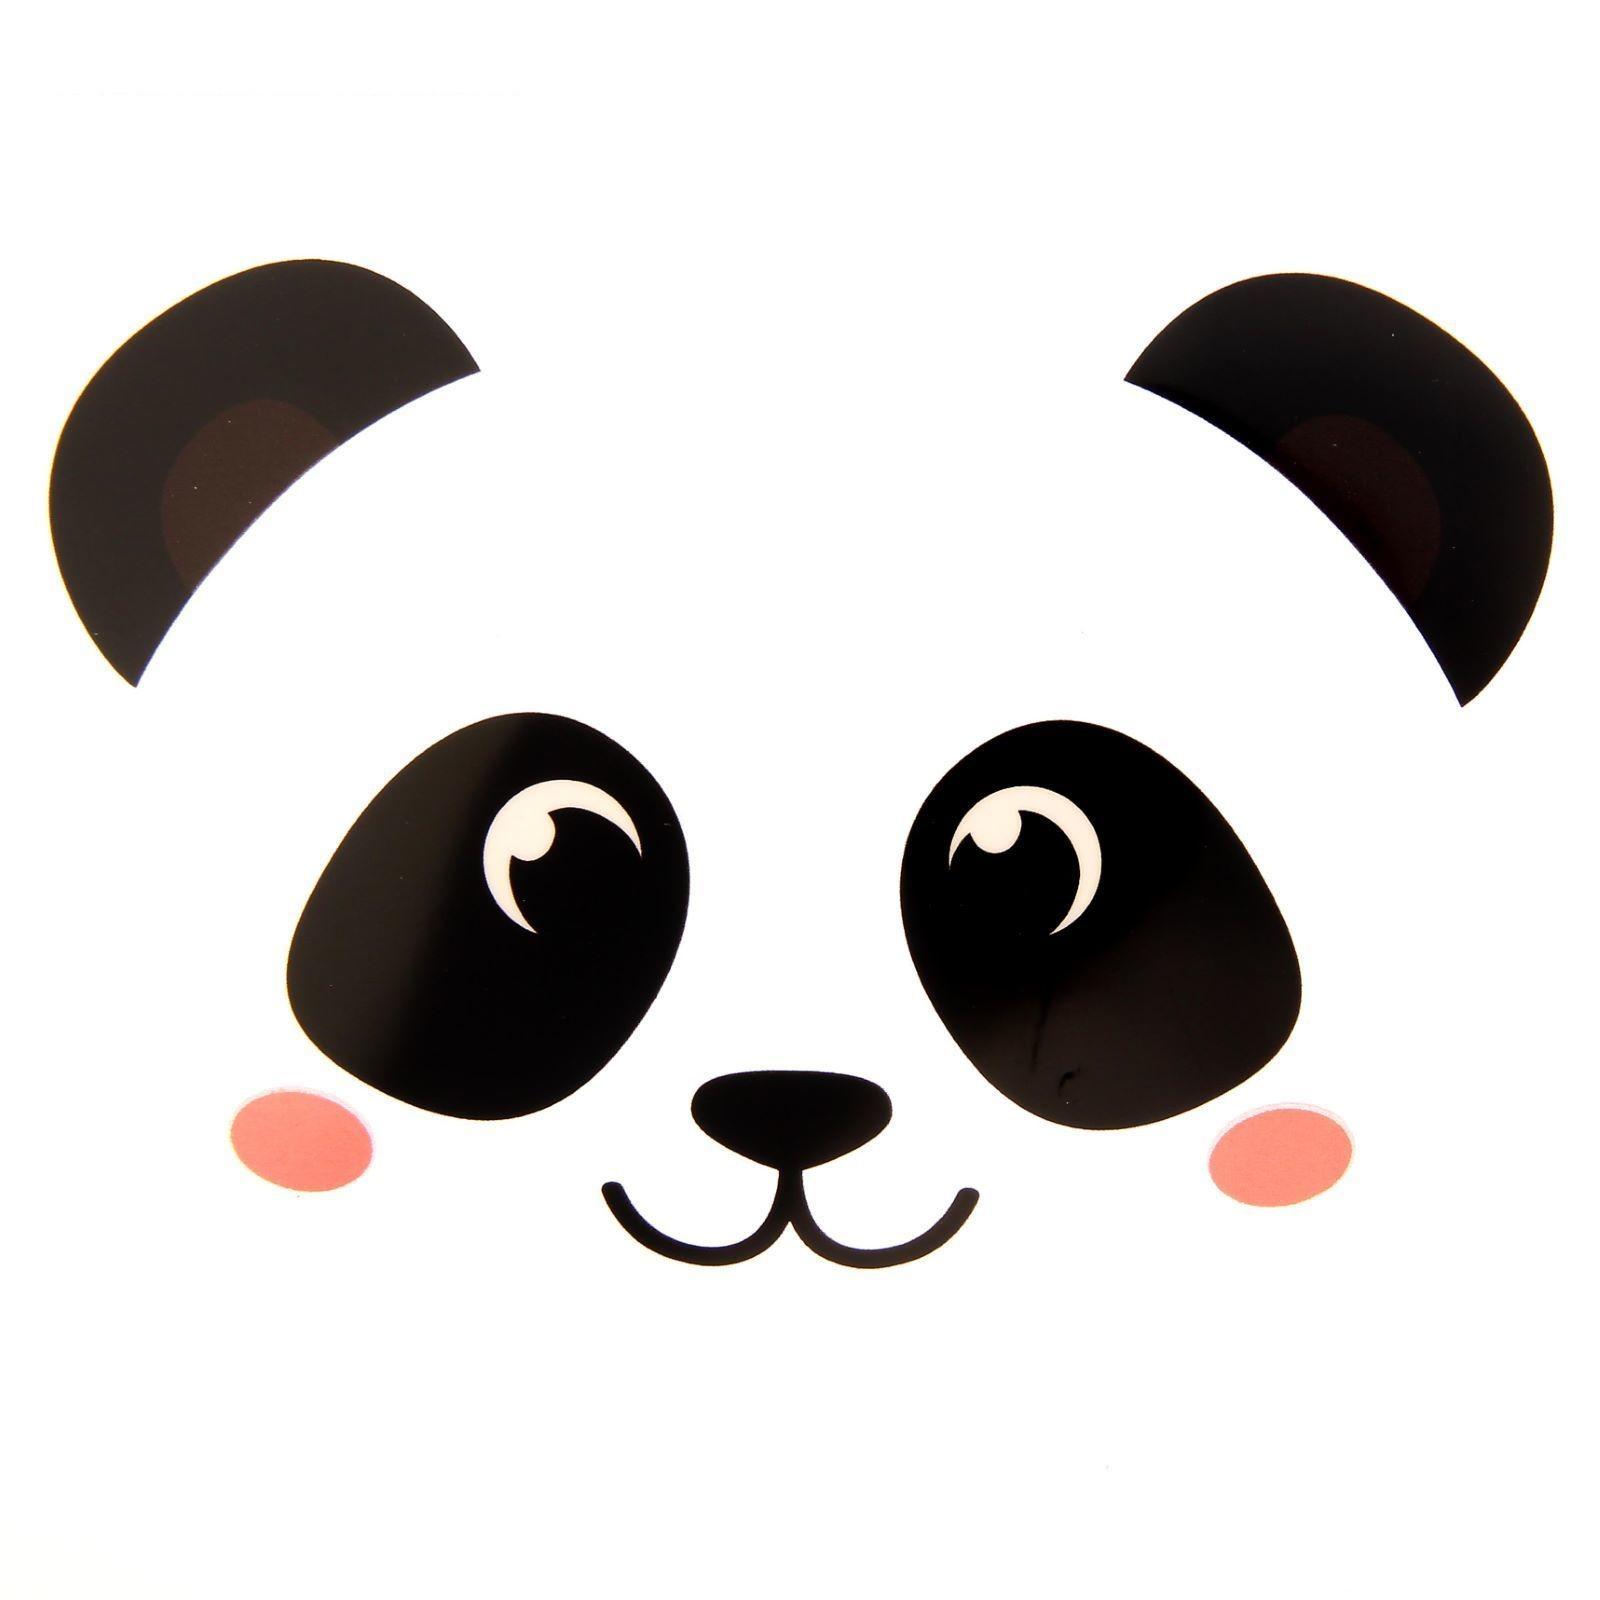 Panda face drawing for kids